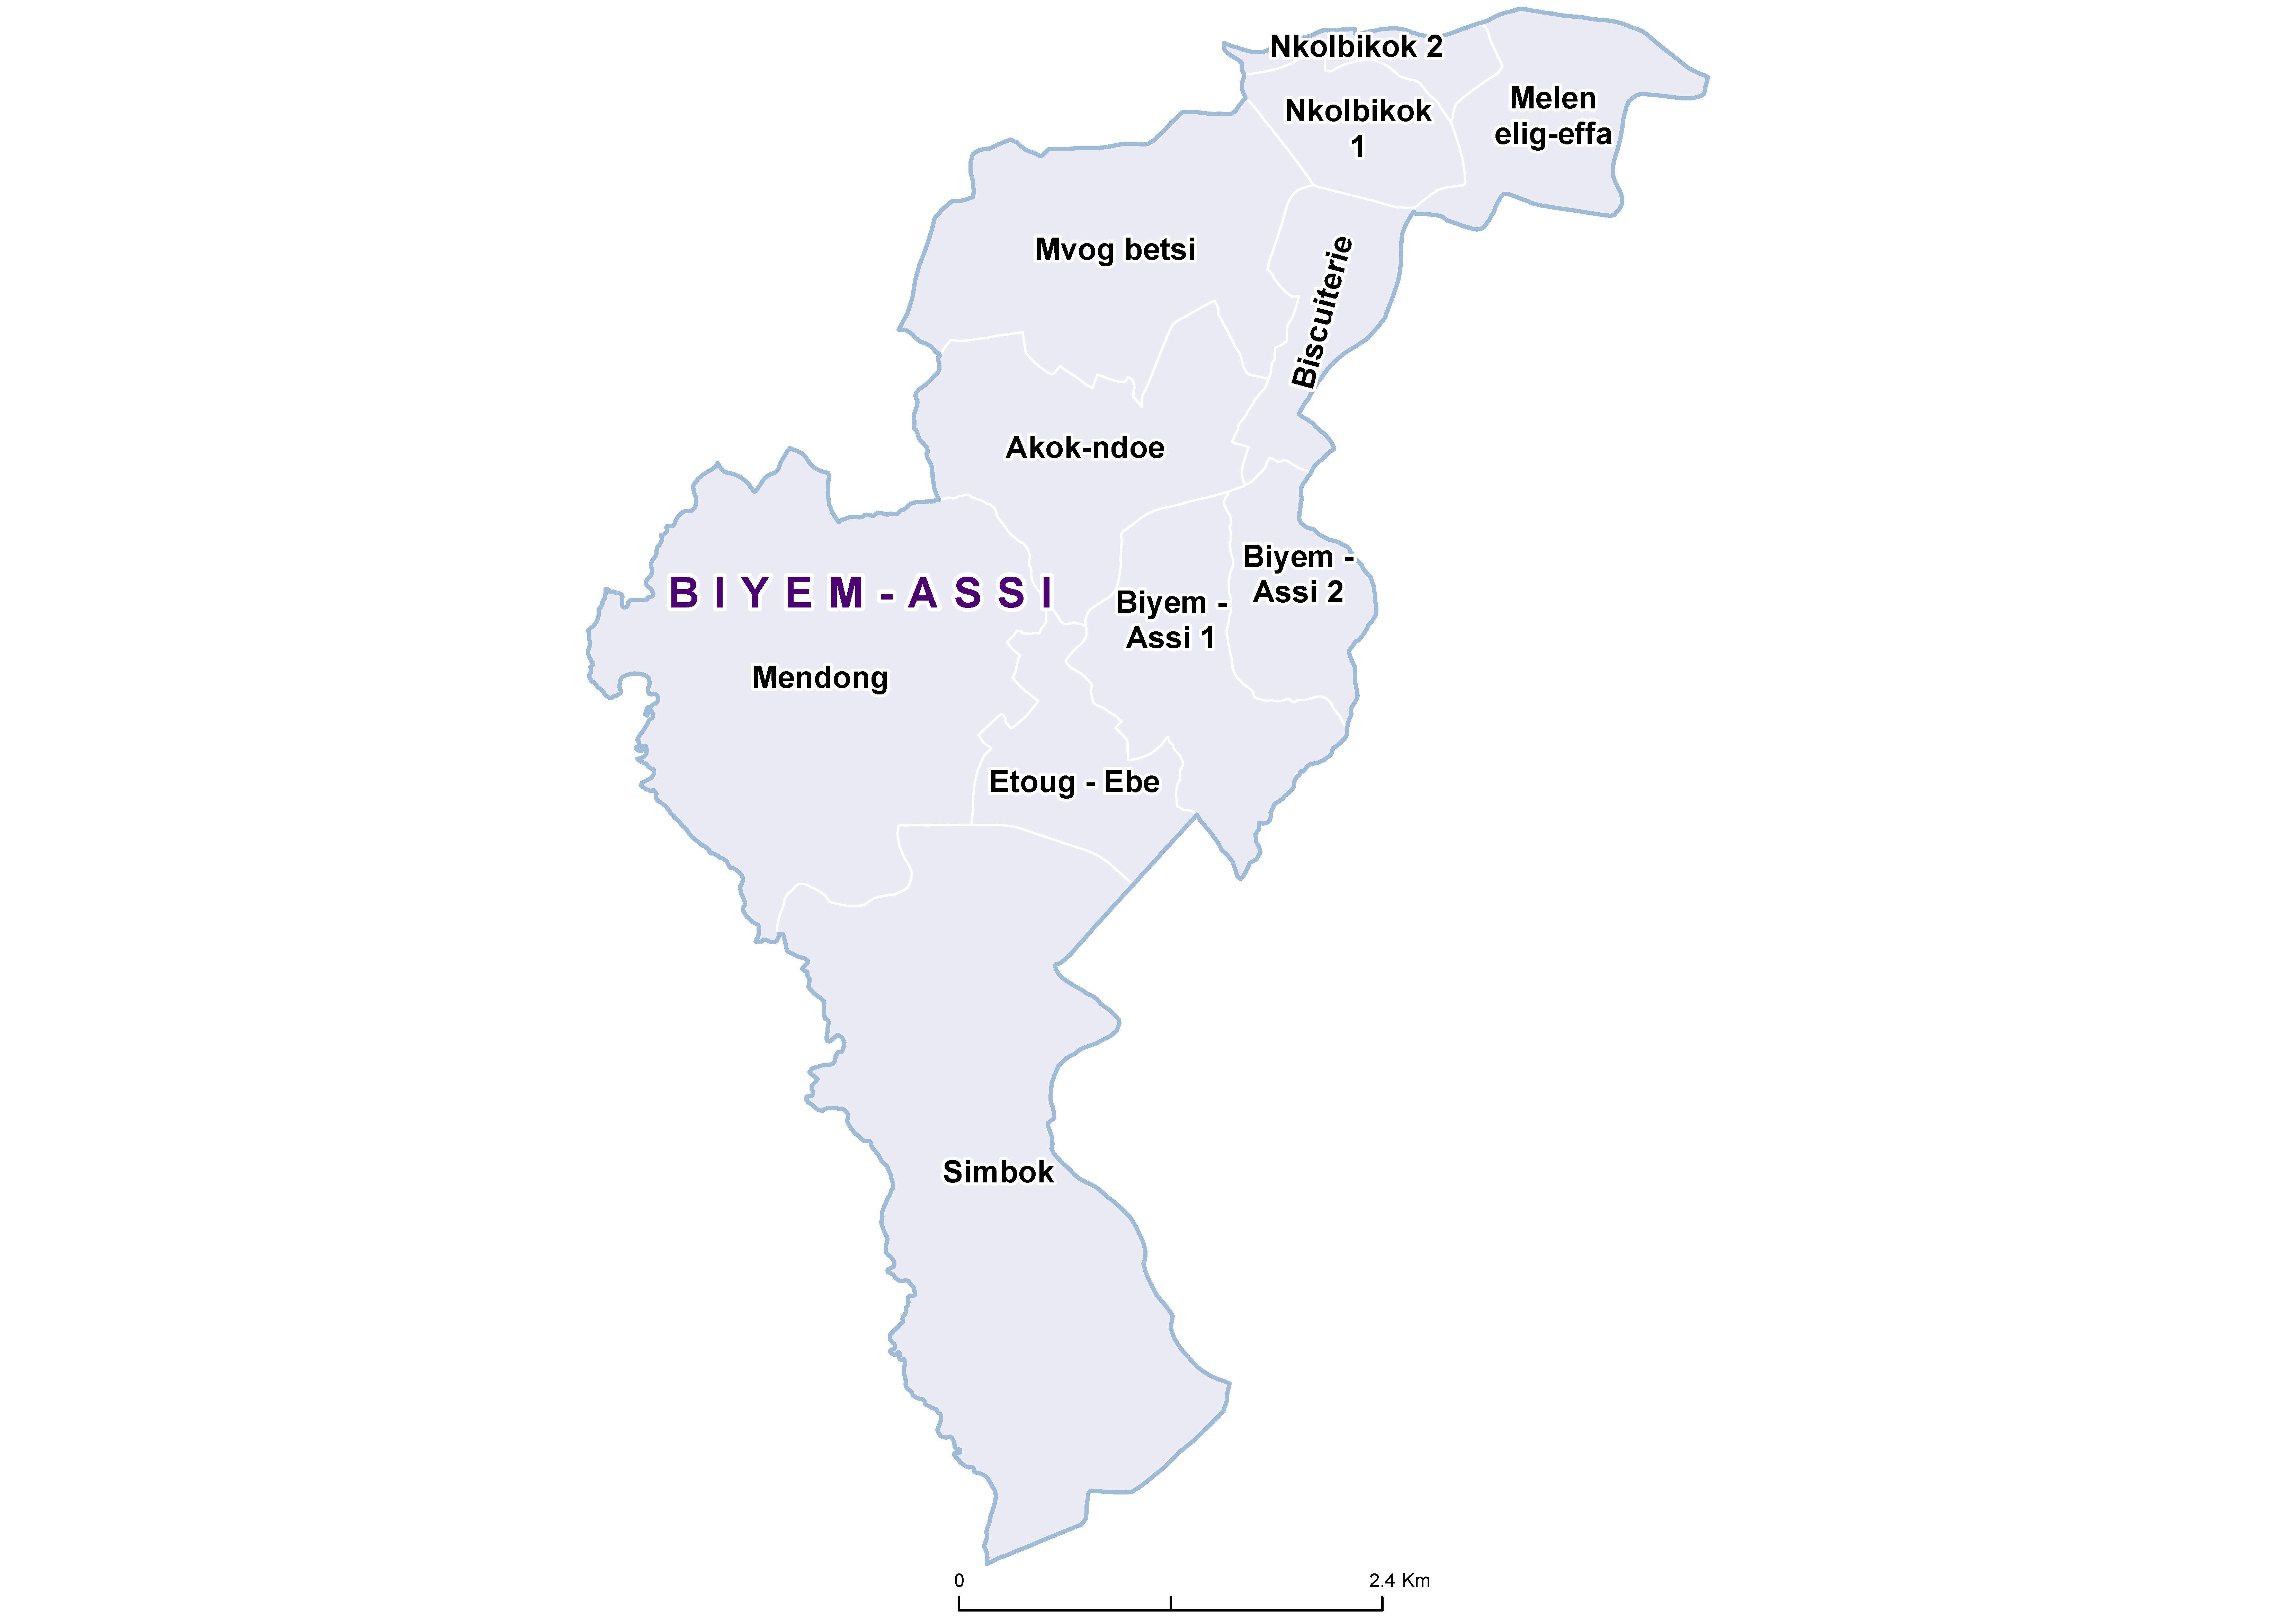 Biyem-assi SCH 19850001